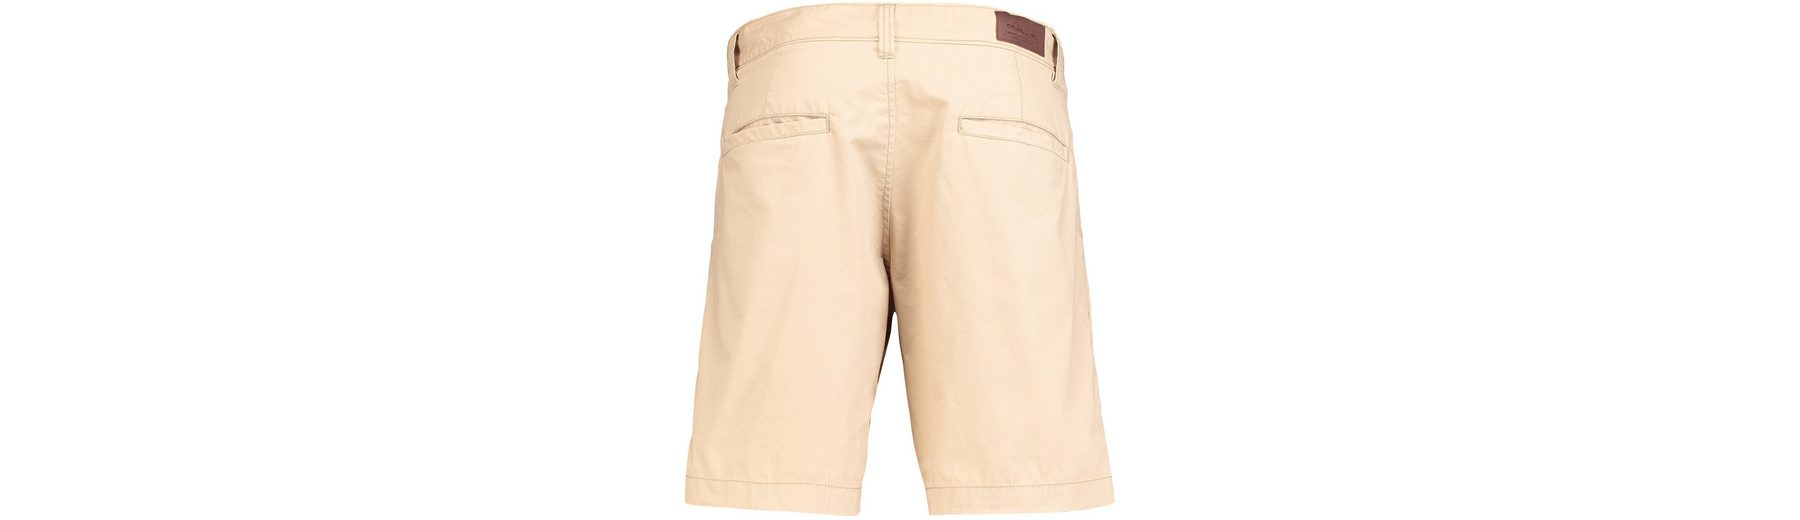 Niedriger Preis Versandgebühr O'Neill Walkshorts Sundays shorts Online-Shop Aus Deutschland Günstige Verkaufspreise Rabattpreise zBfeKysE